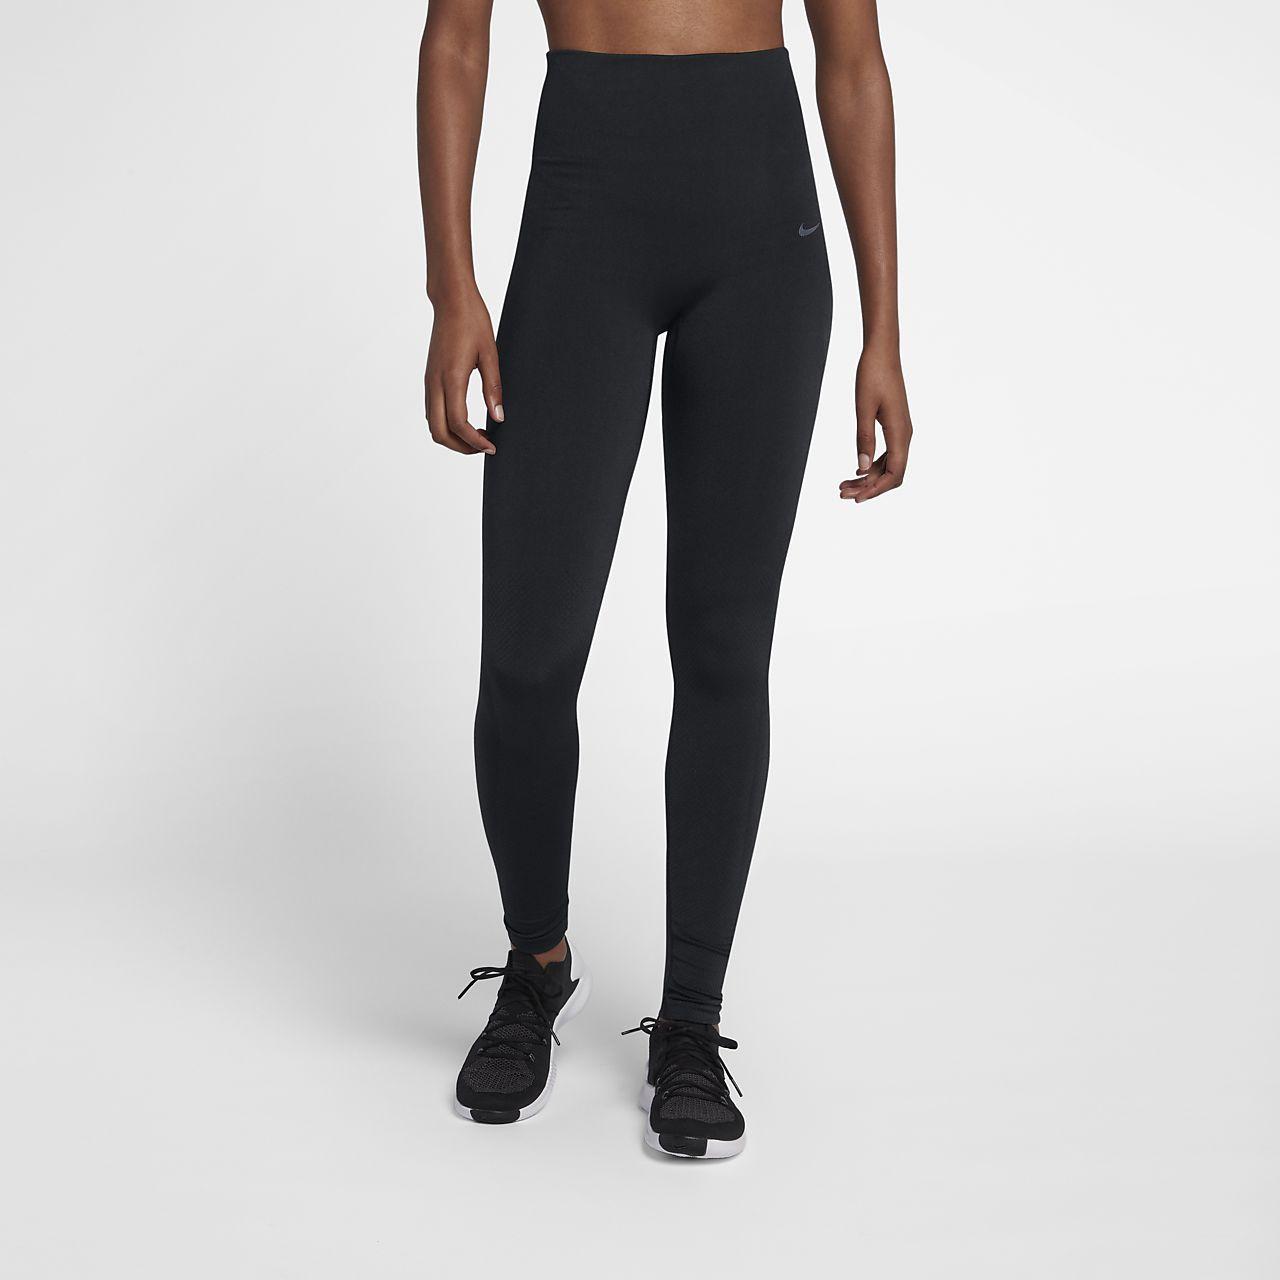 70d5ab155ac7 Nike Power Studio Women s Training Tights